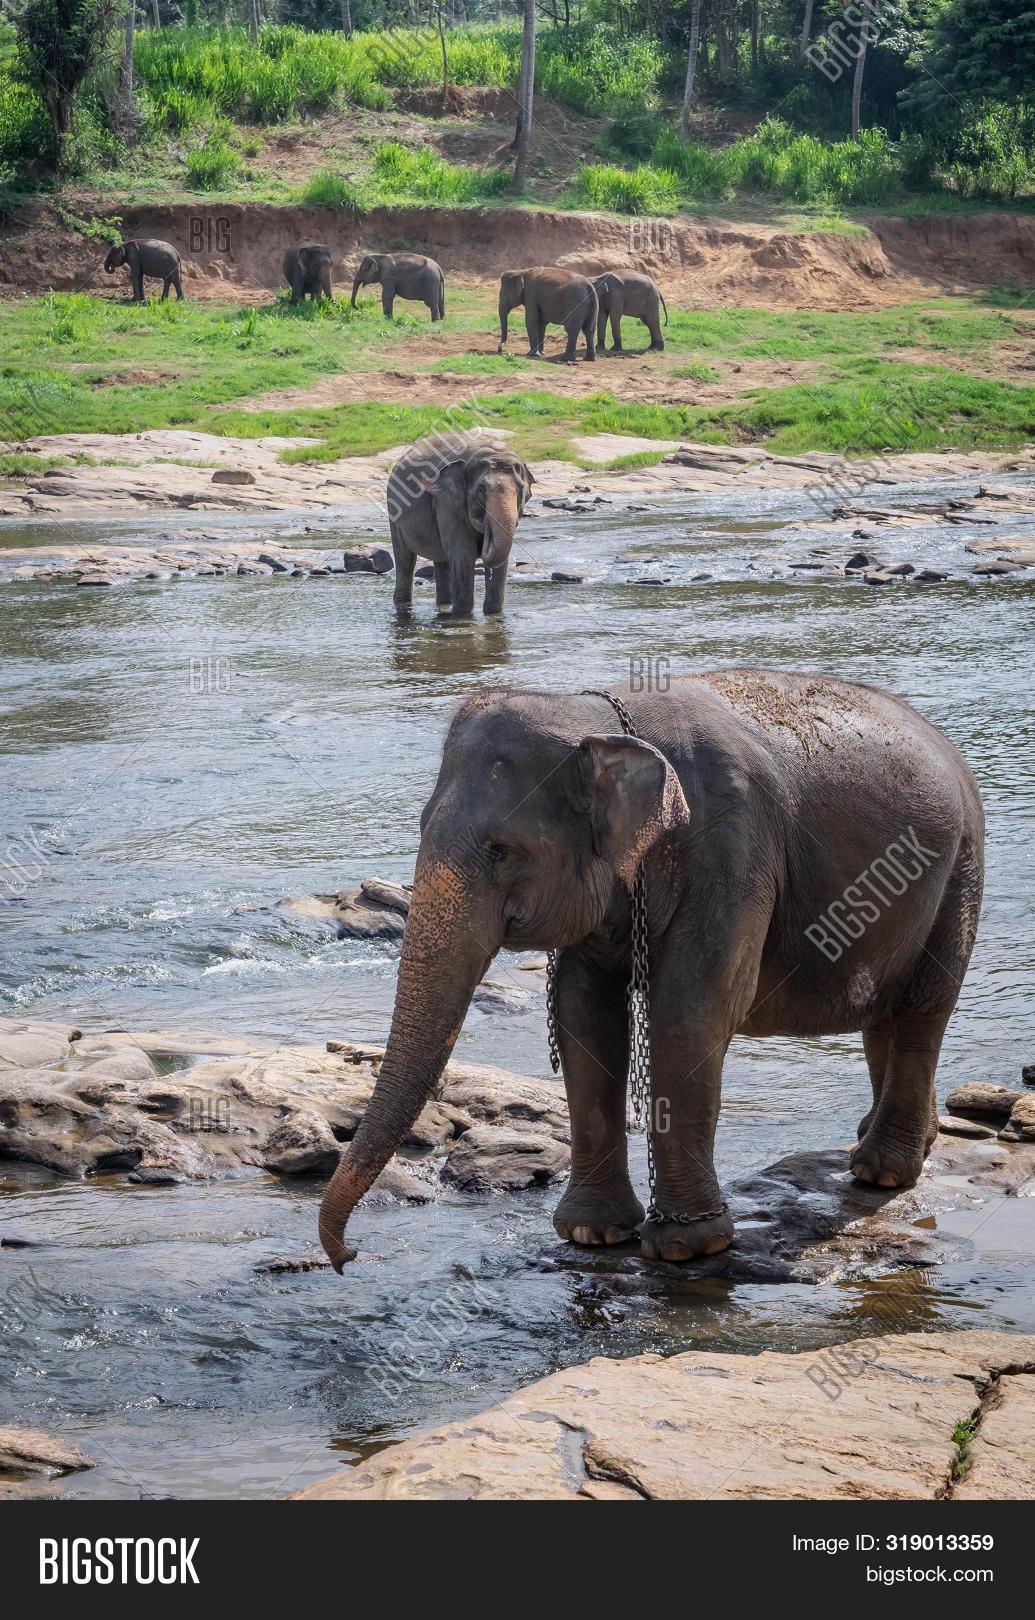 Asian Elephants at Pinnawala Elephant Orphanage, Sri Lanka Here is nursery and captive breeding ground for wild Asian elephants located at Pinnawala village.